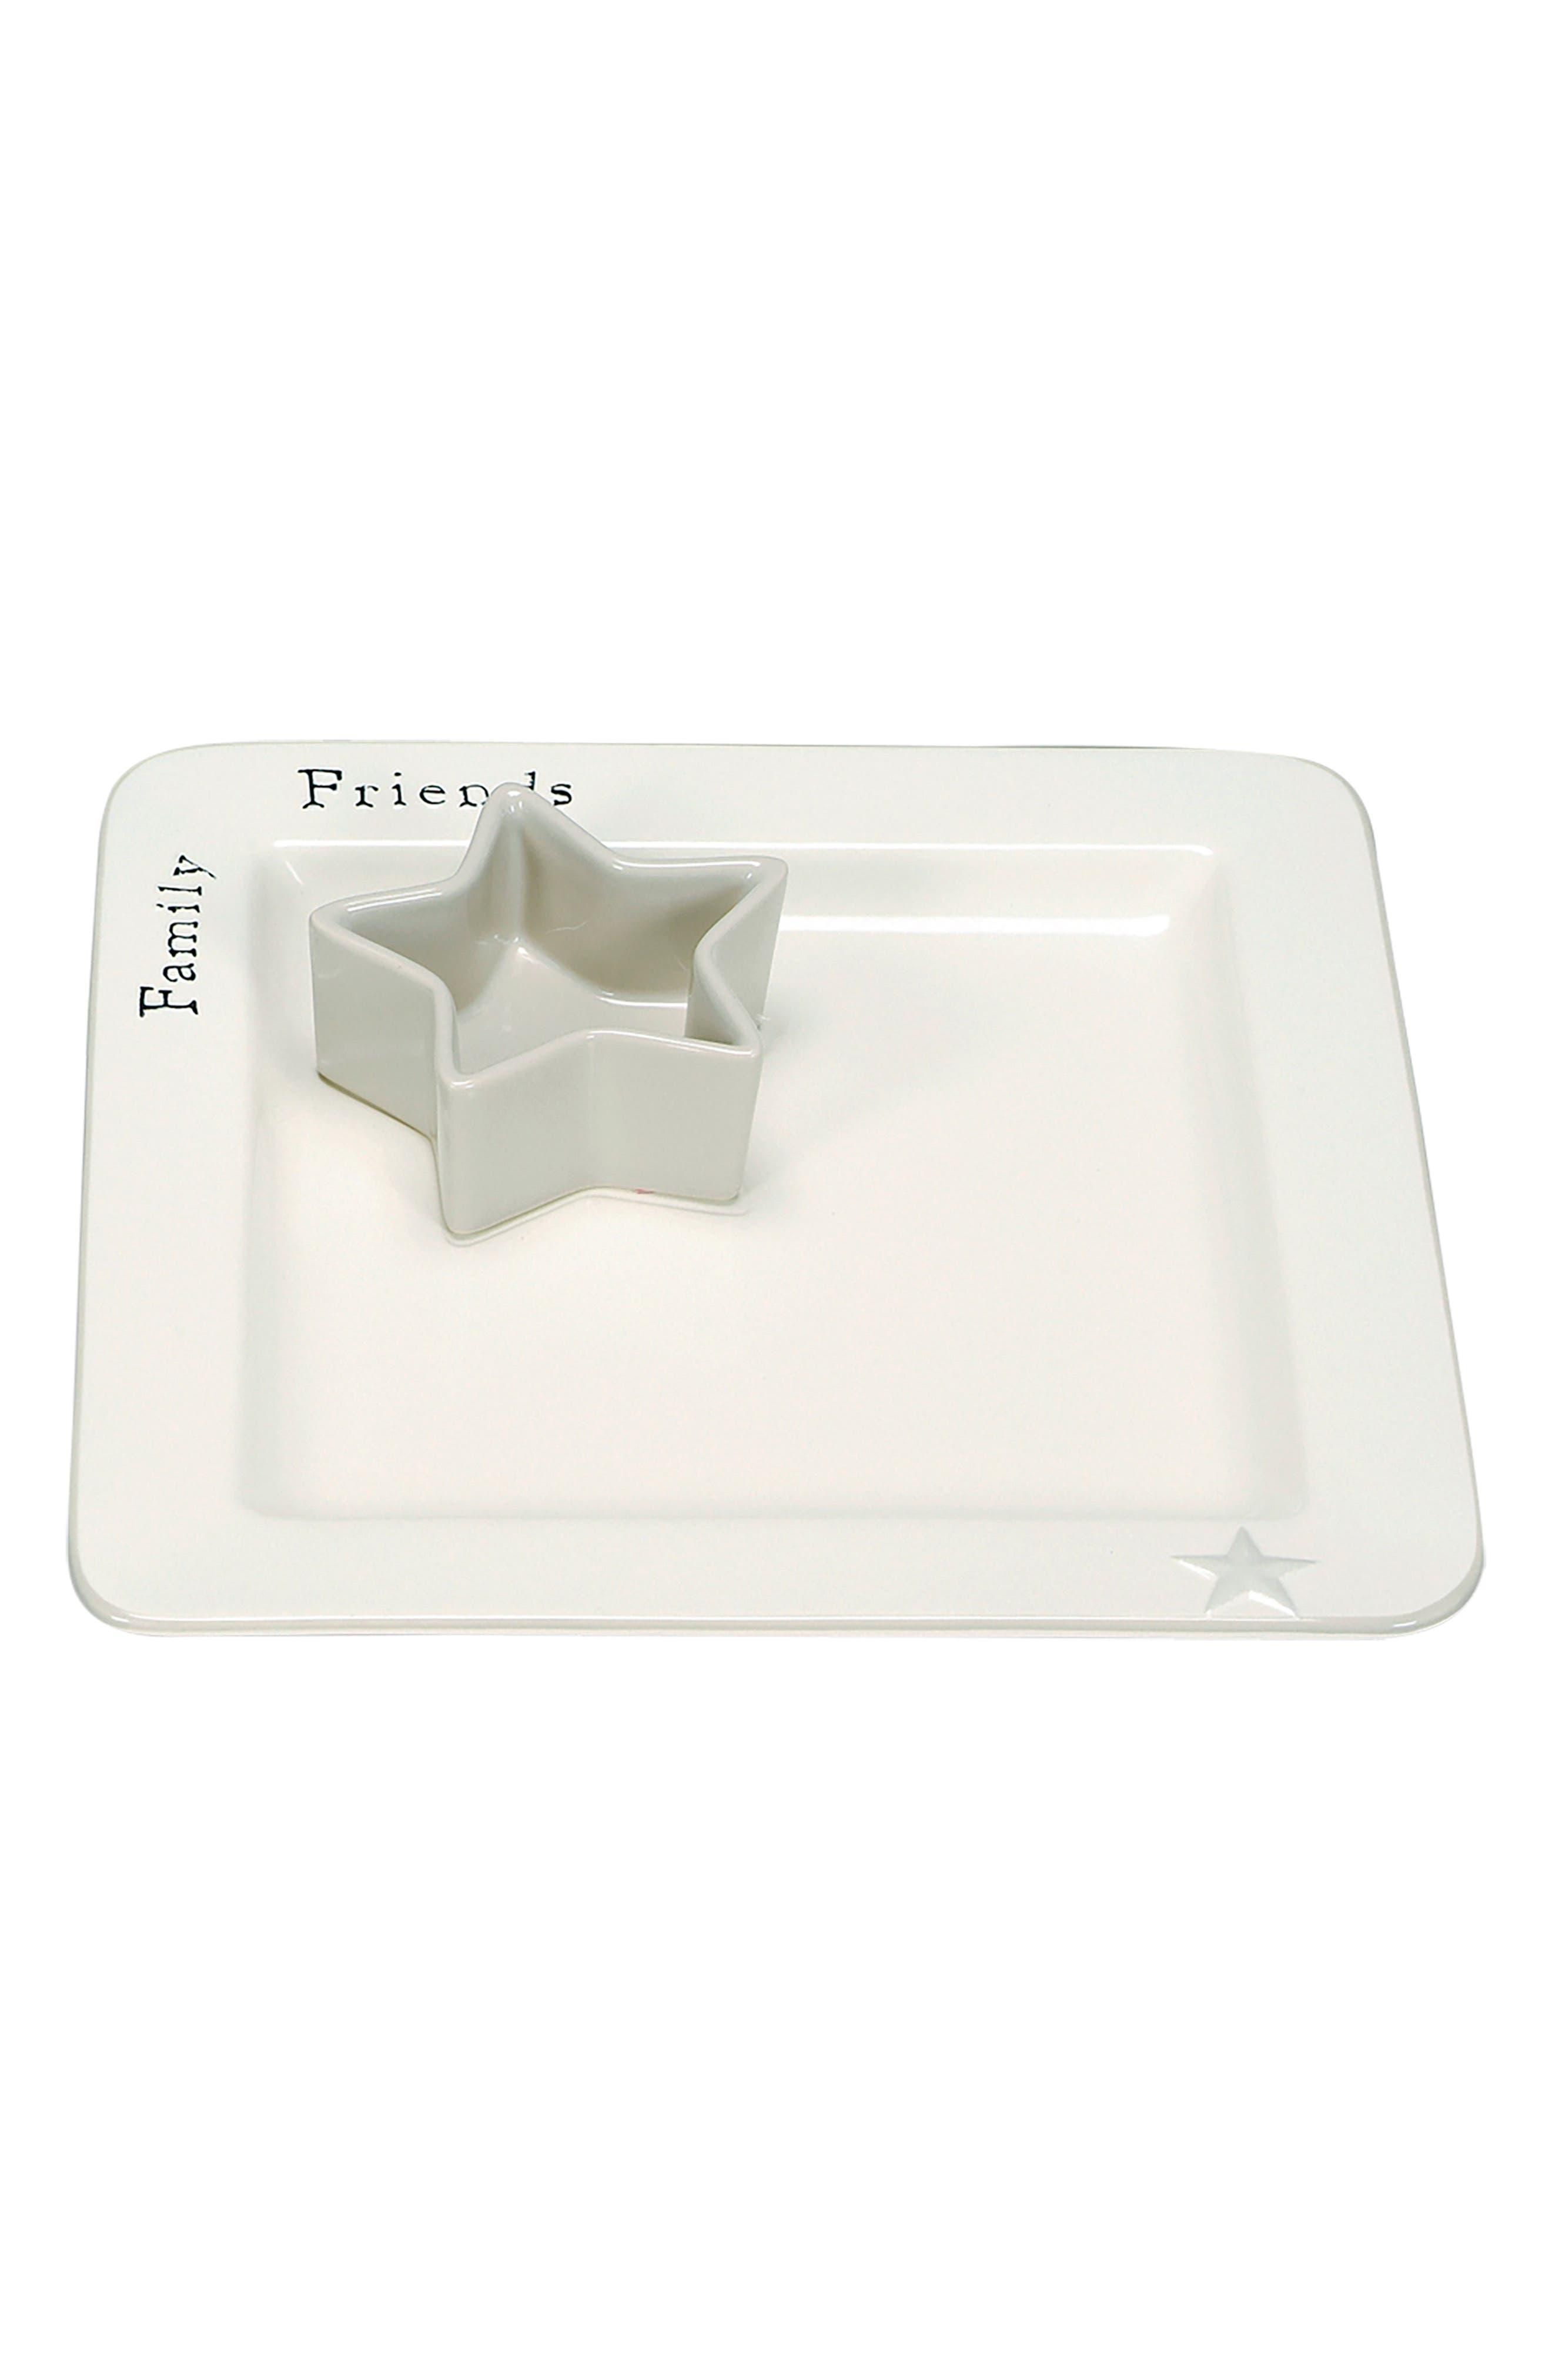 Word Expressions Serving Platter & Bowl Set,                         Main,                         color, White